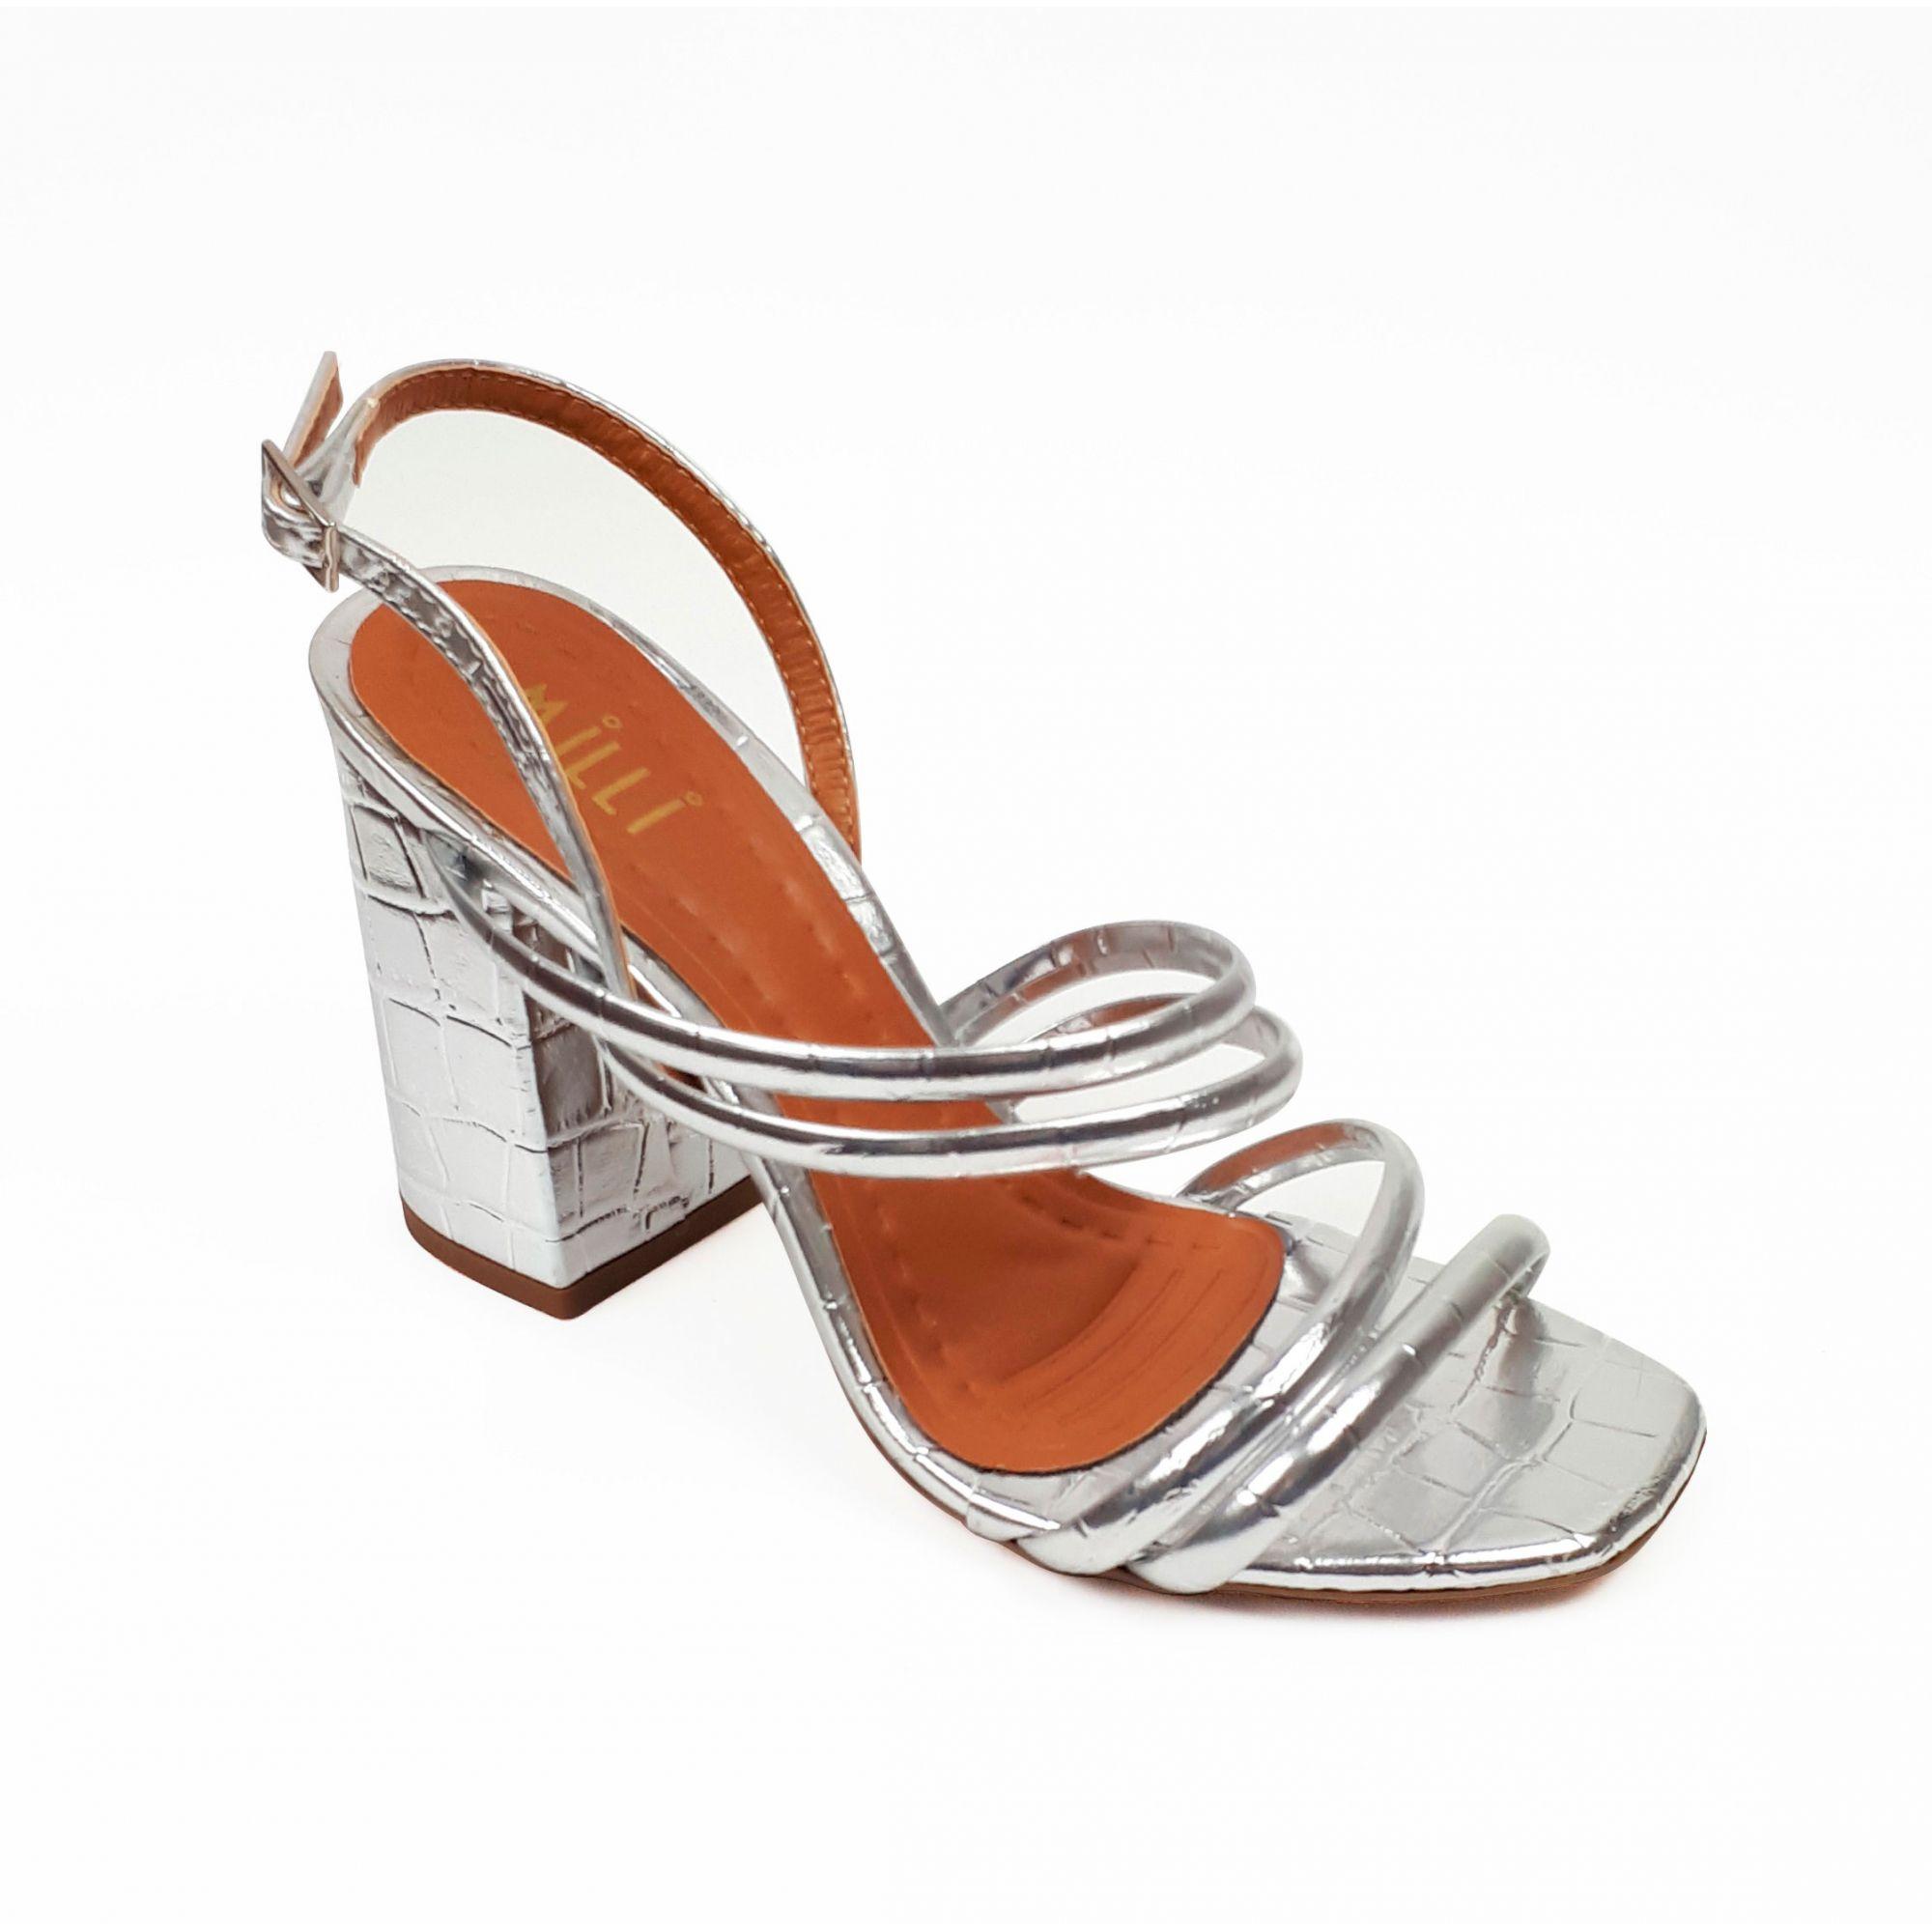 Sandália croco metalizada prata